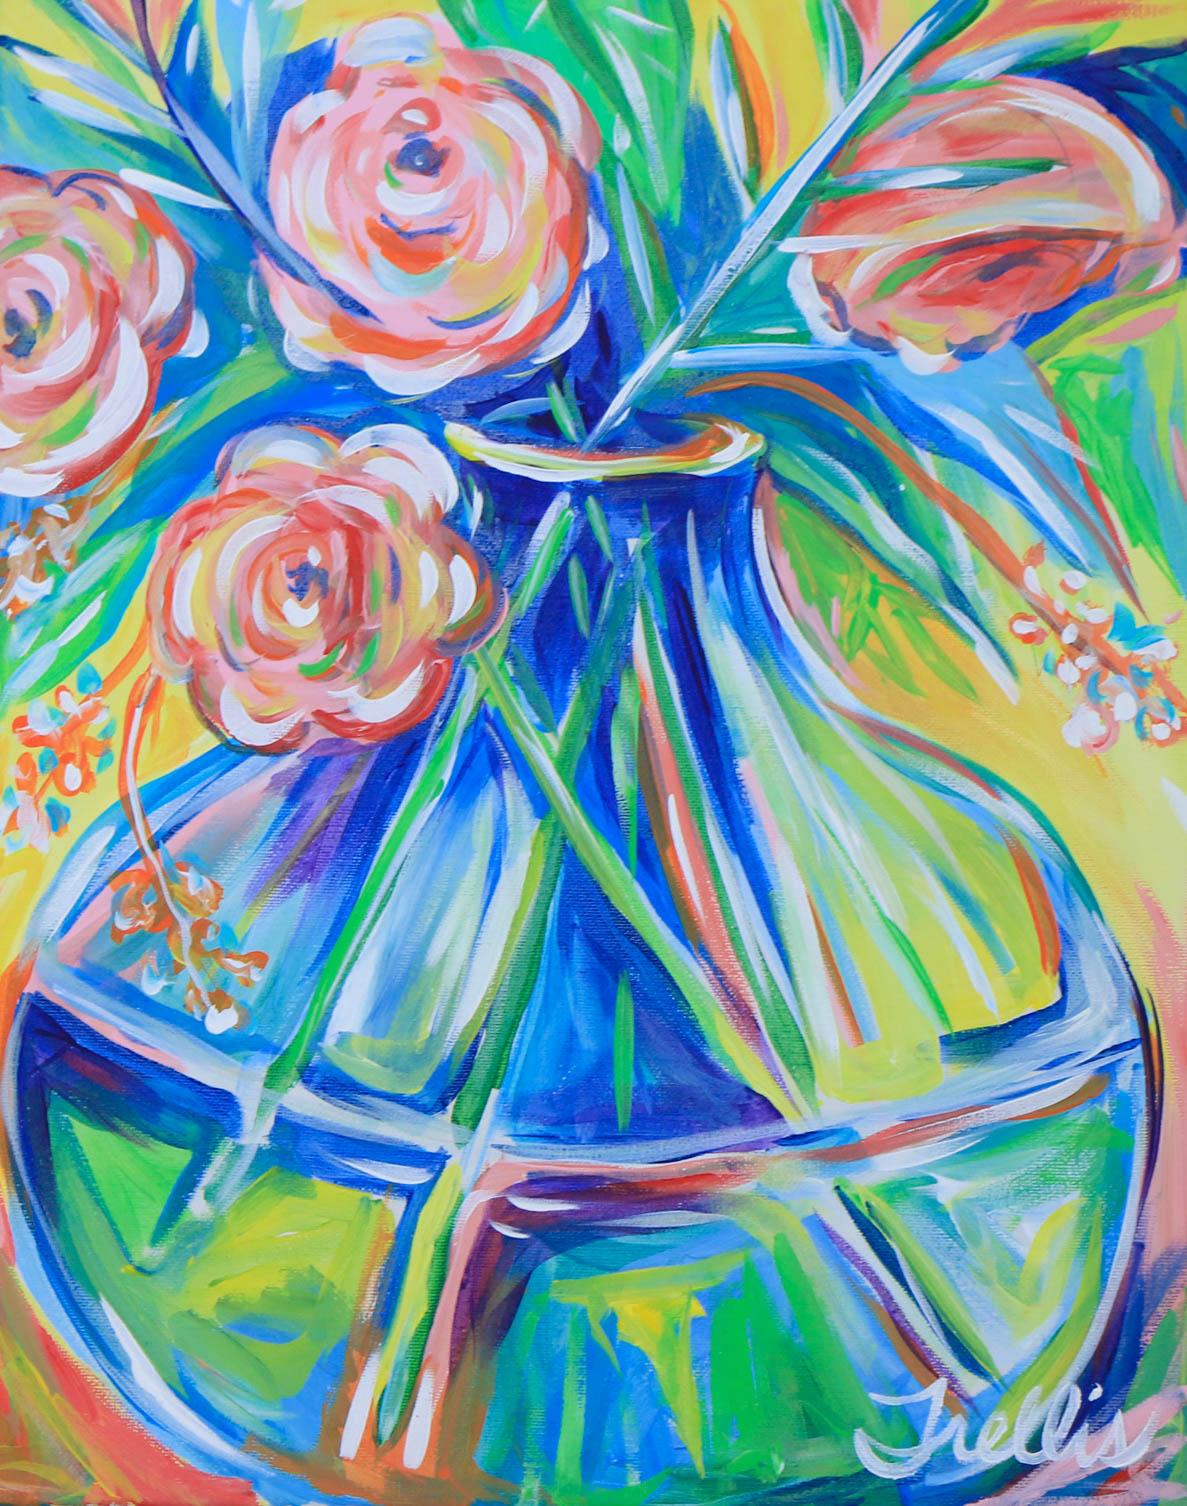 """Freshly picked""    (16""x20"") Acrylic on canvas."